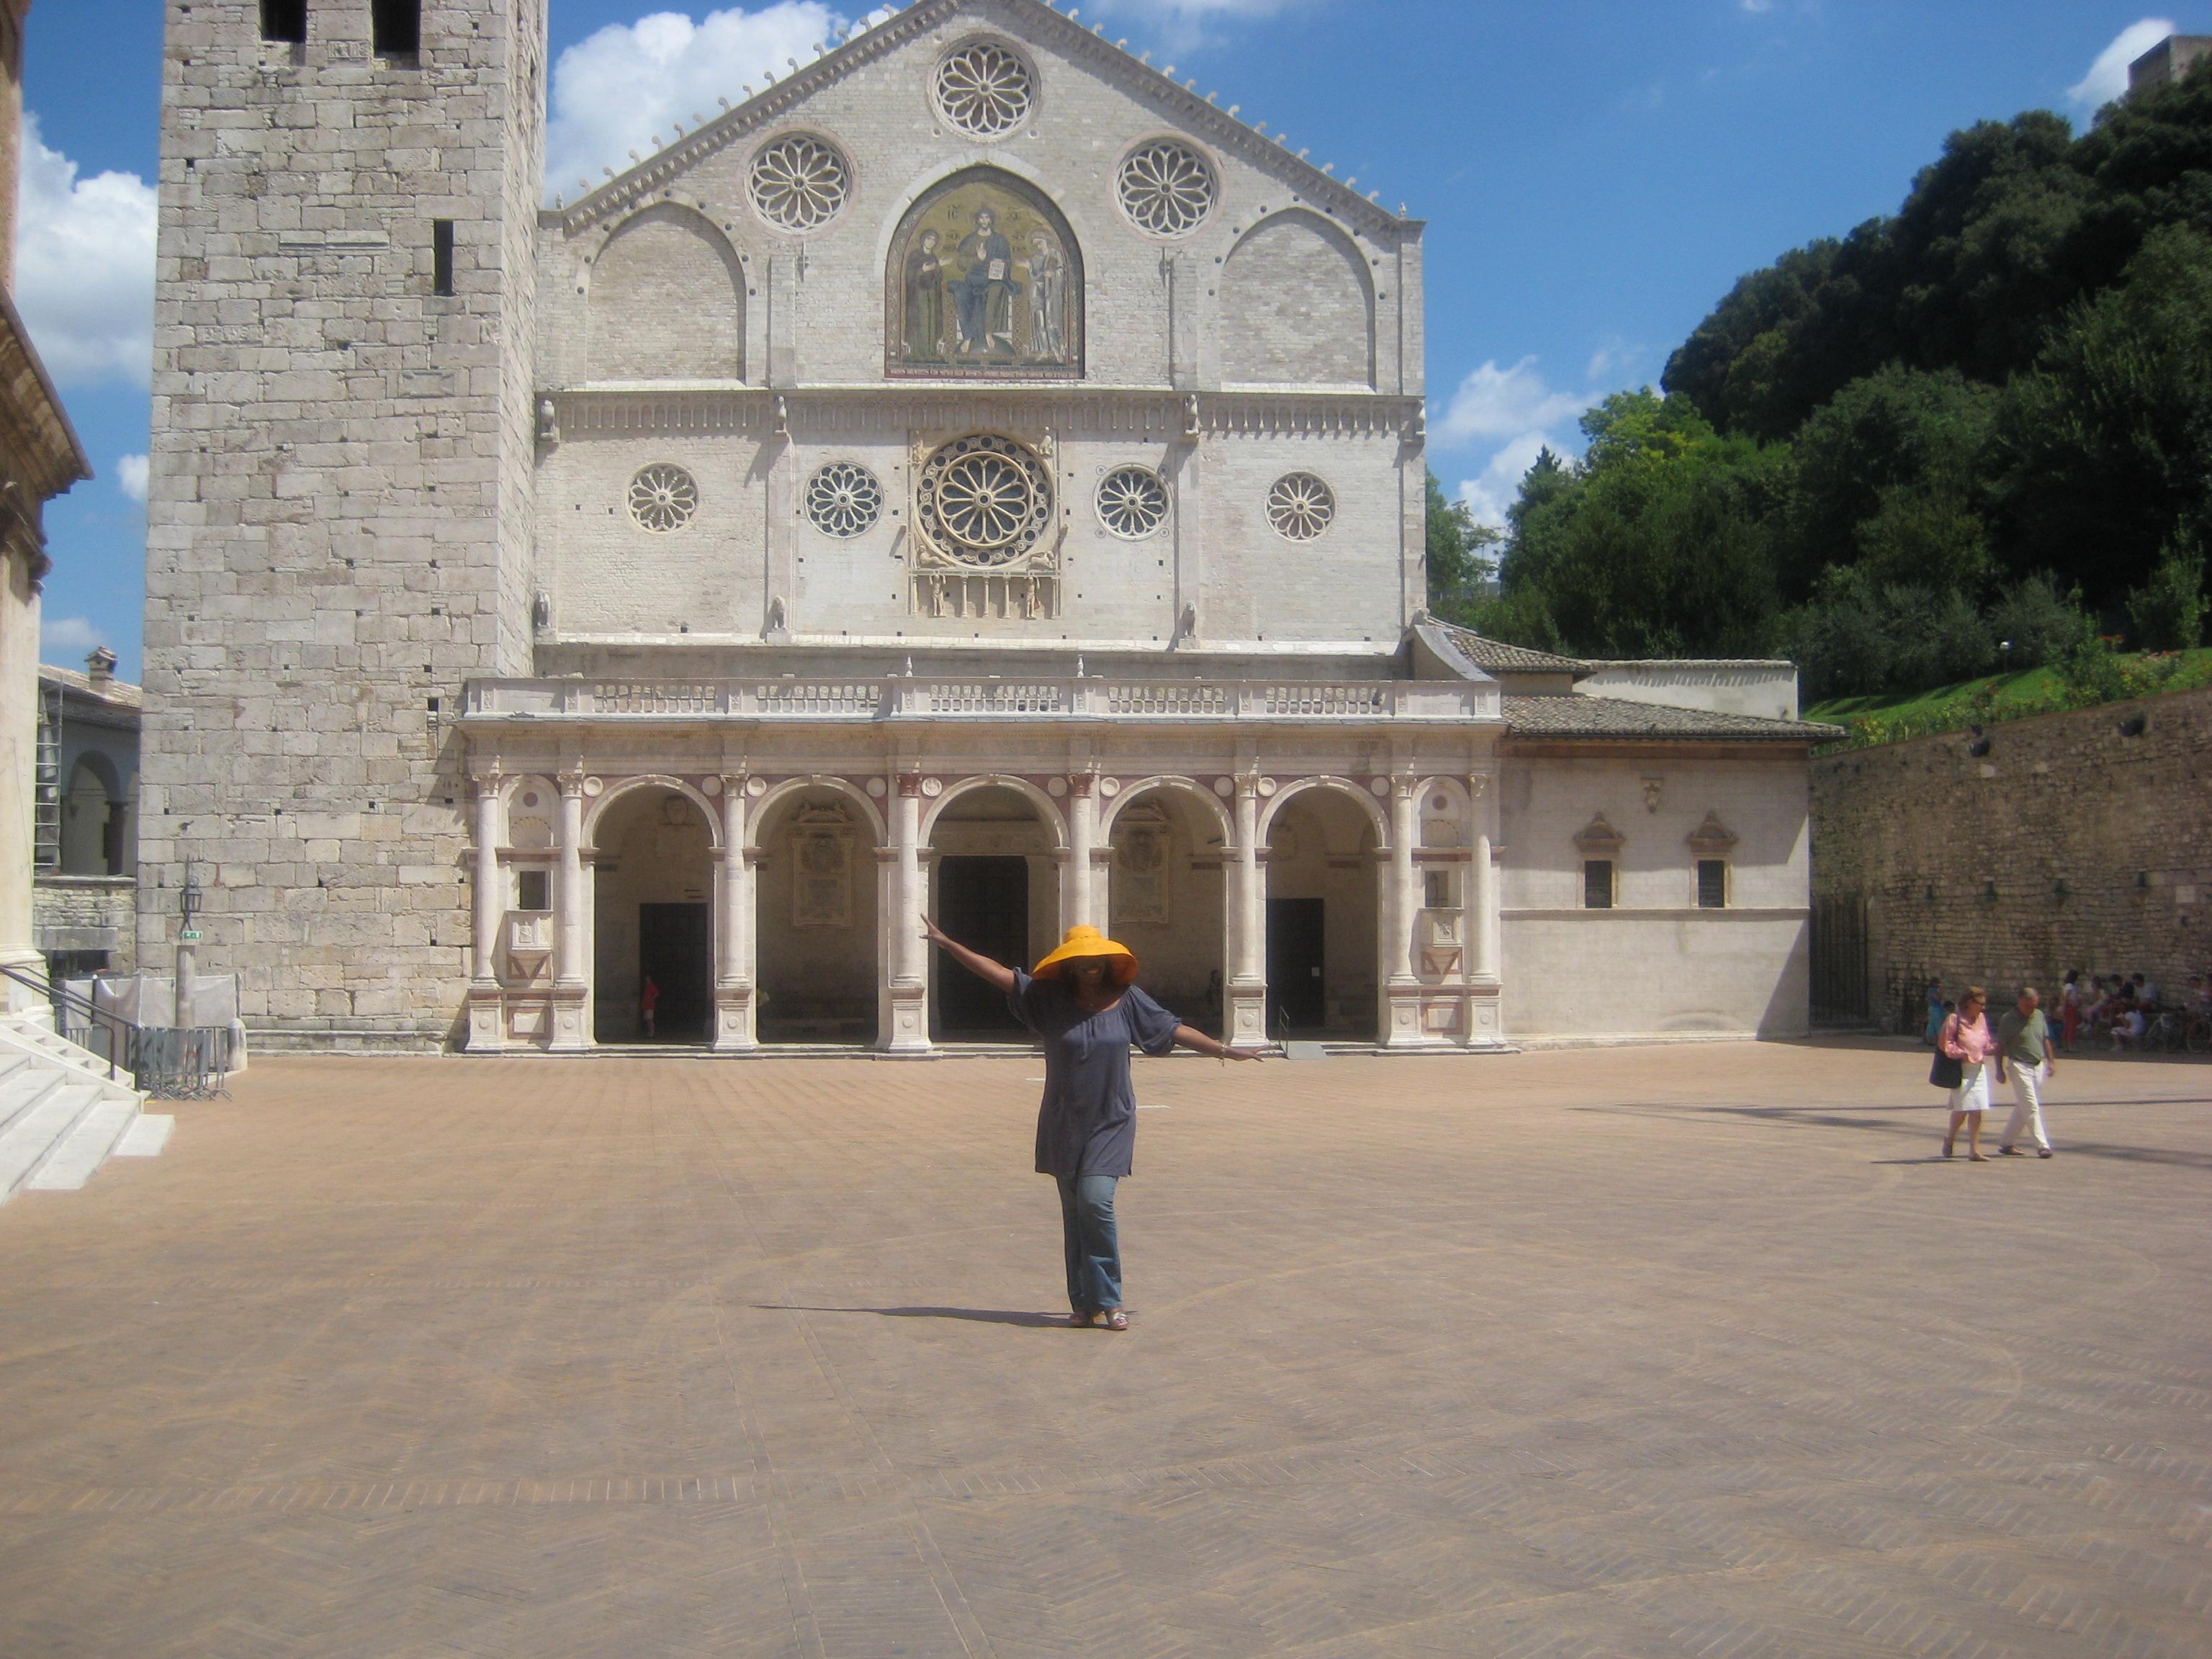 Piazza del Duomo - Spoleto, Italy